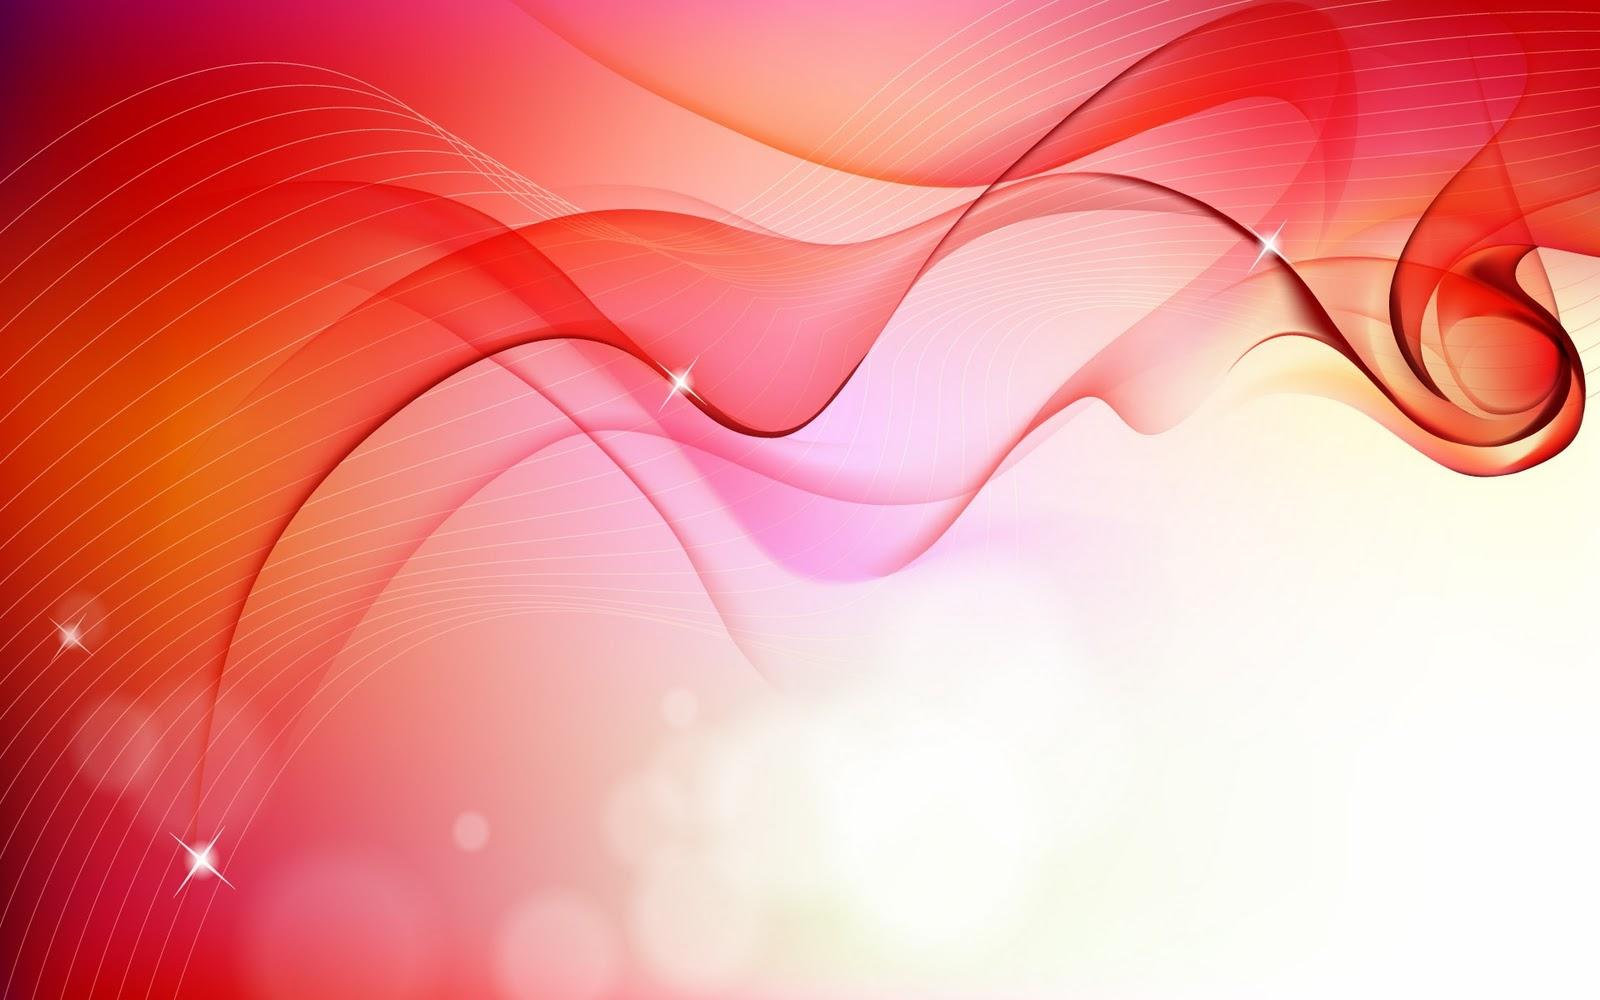 http://3.bp.blogspot.com/_nJz_VADoBJE/TM6luMIXAYI/AAAAAAAABFg/7vdEX5m_W38/s1600/Bright_Silk_Scarf_Digital_Design.jpg